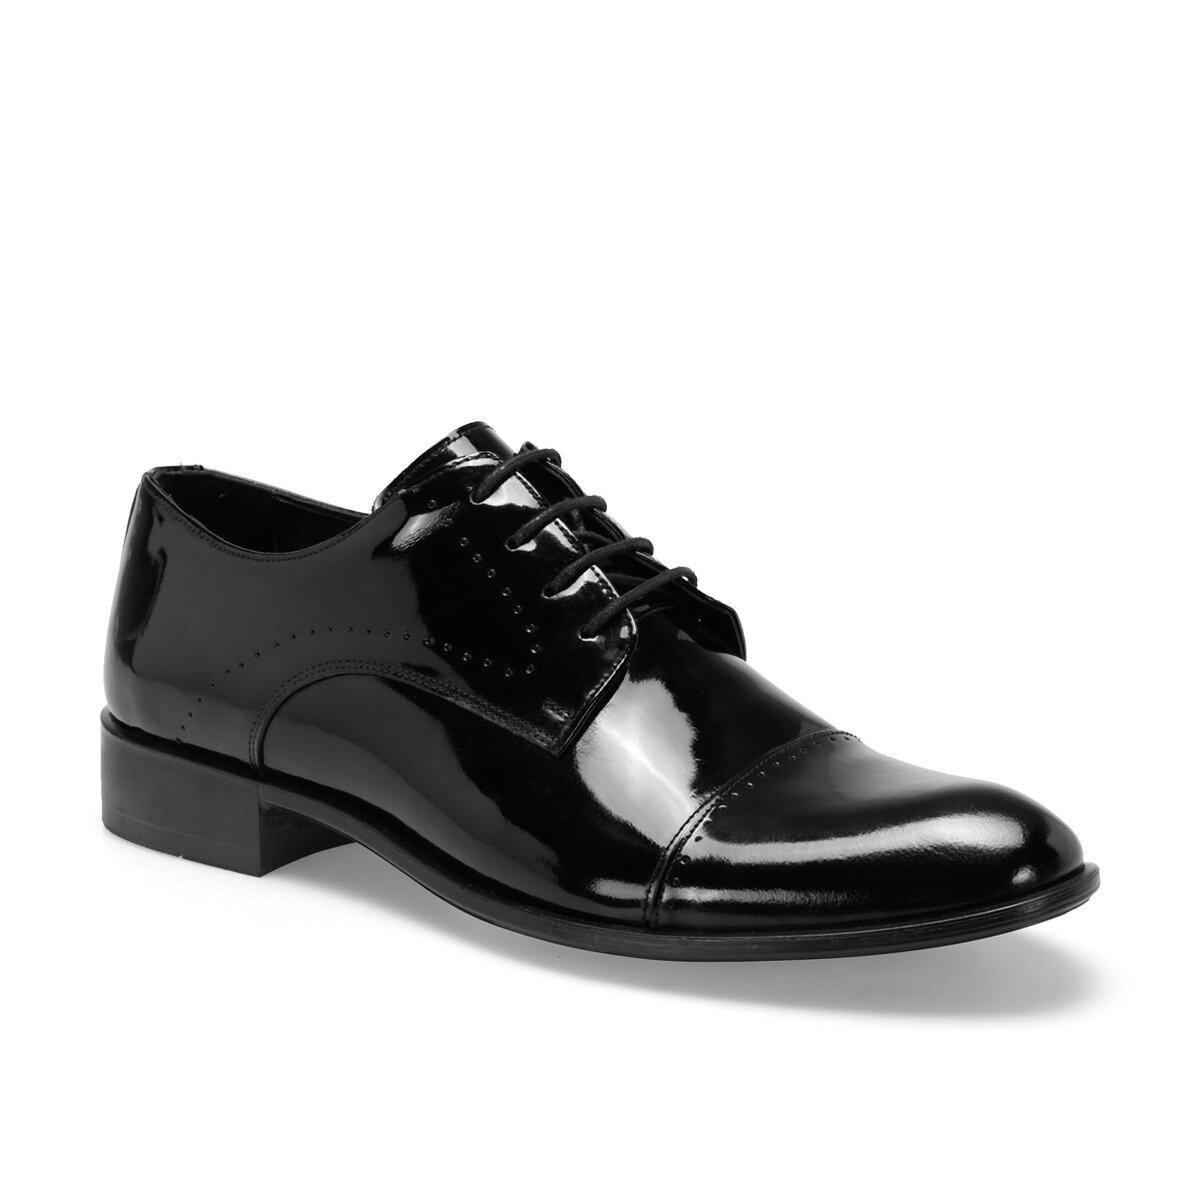 FLO 1776 C Black Male Maskaret Shoes Garamond